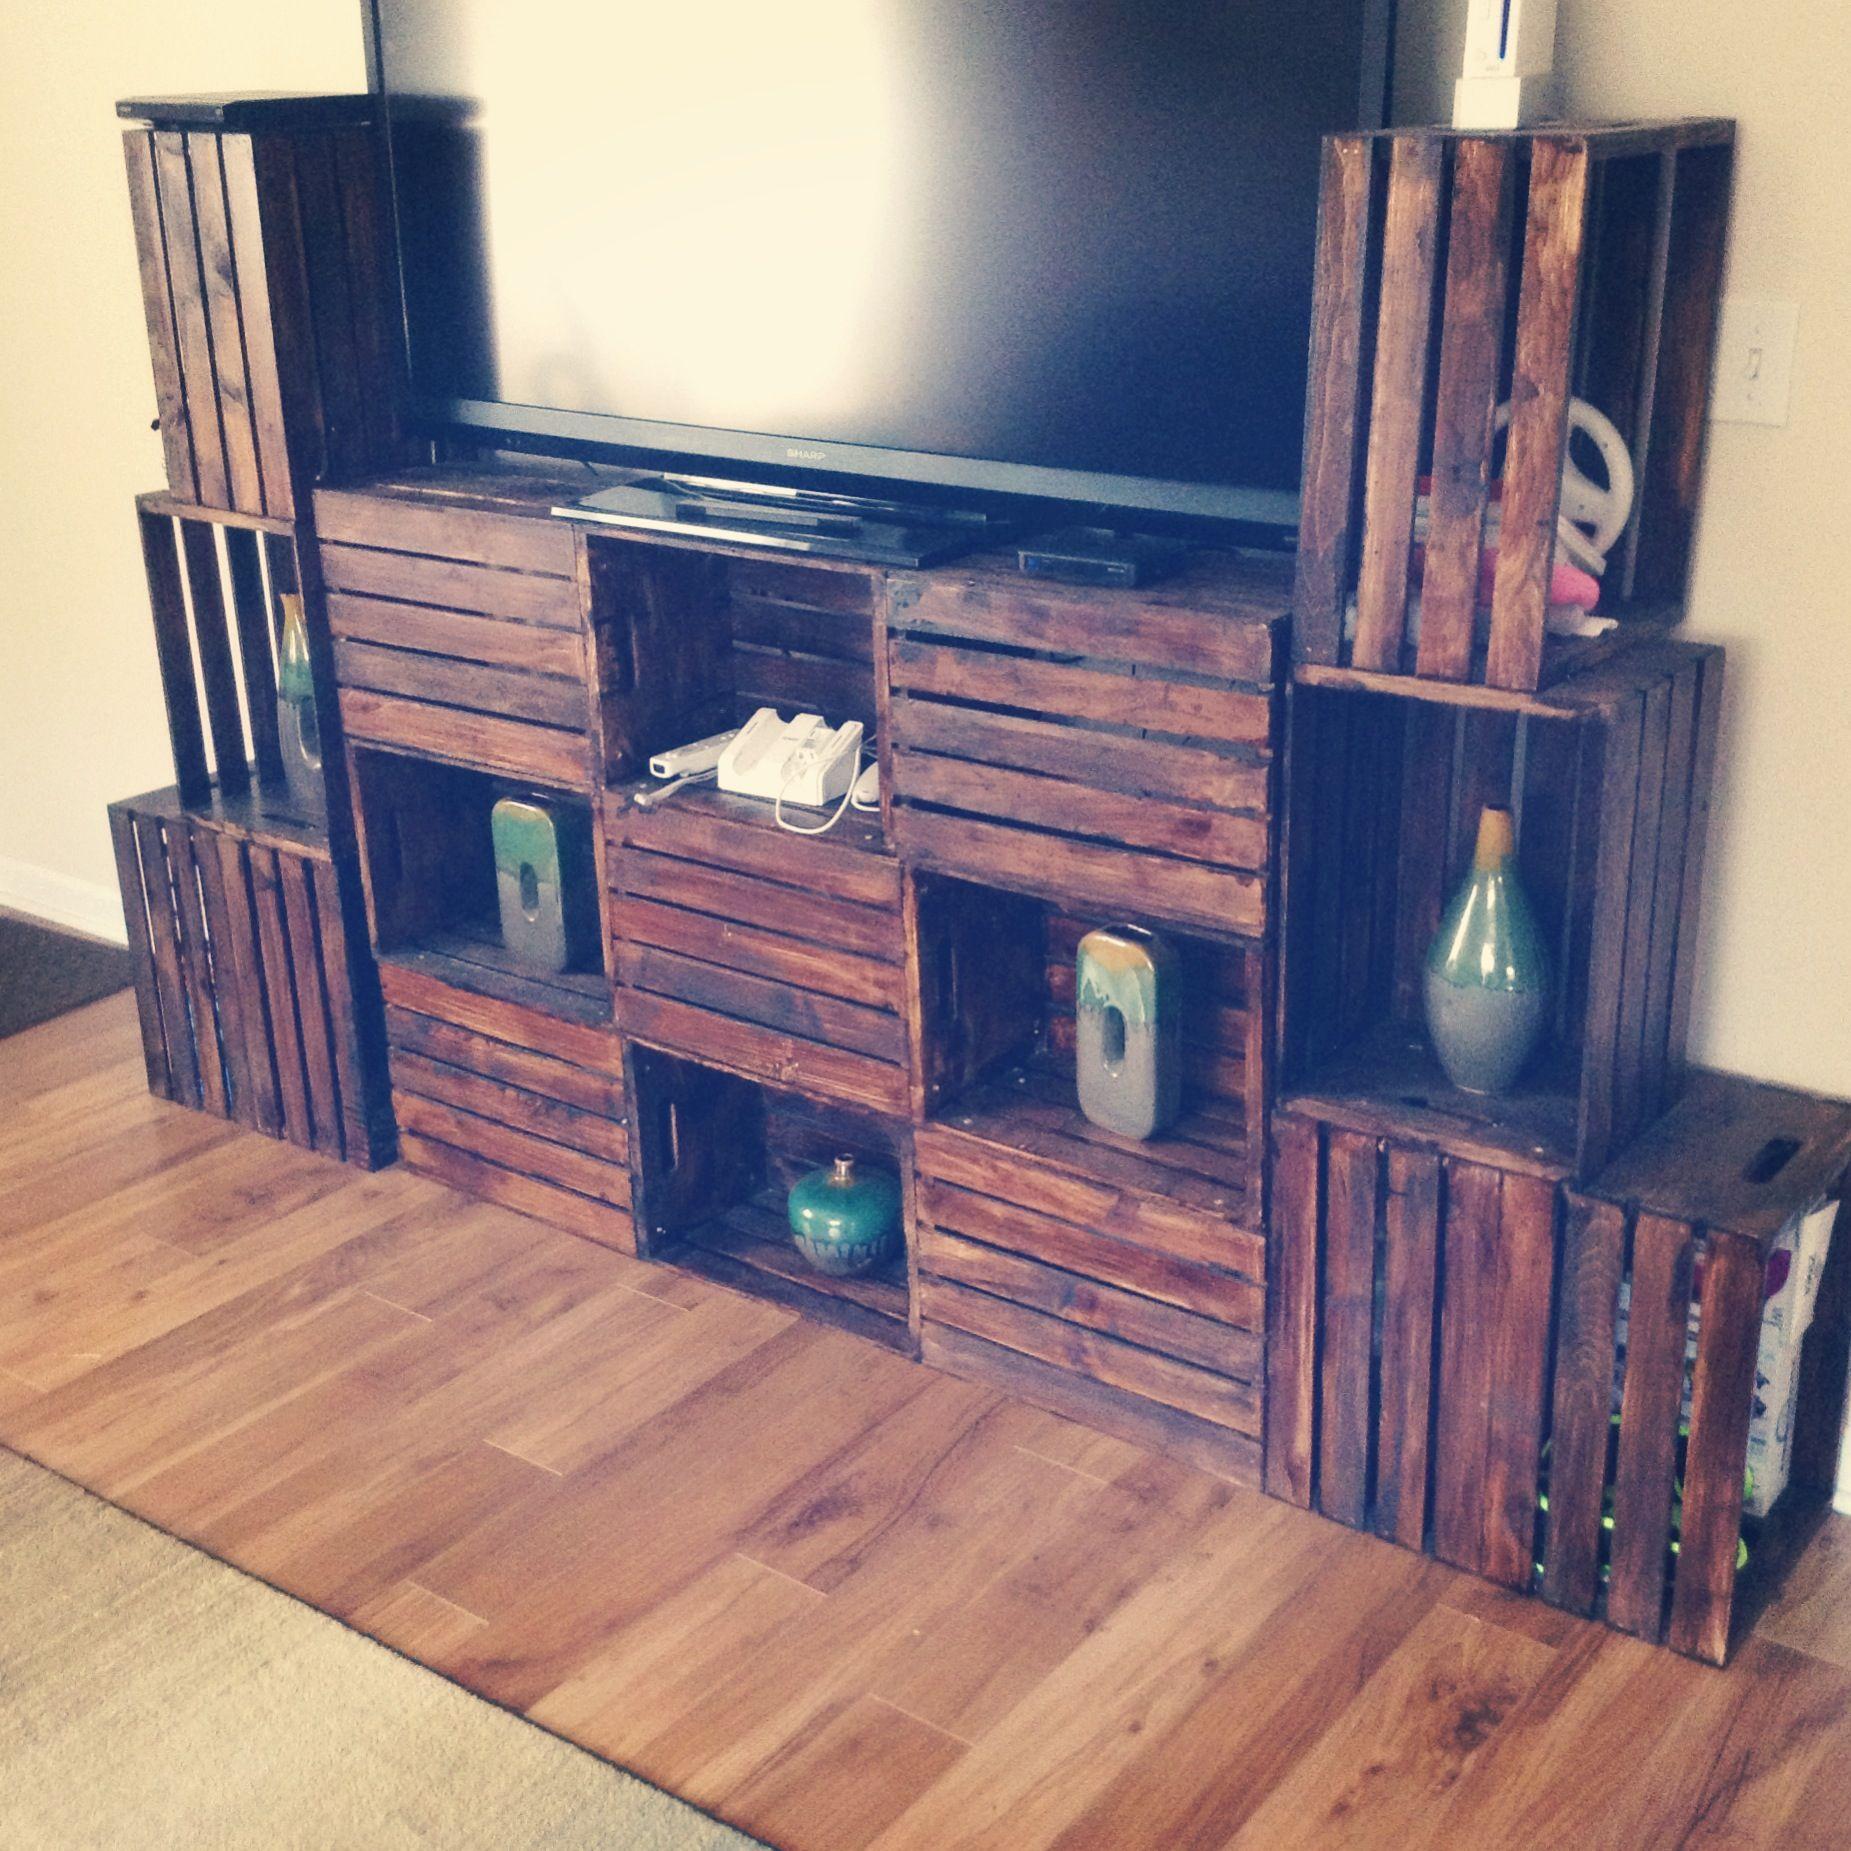 crate furniture diy tv stand diy pinterest zuhause haus und diy m bel. Black Bedroom Furniture Sets. Home Design Ideas